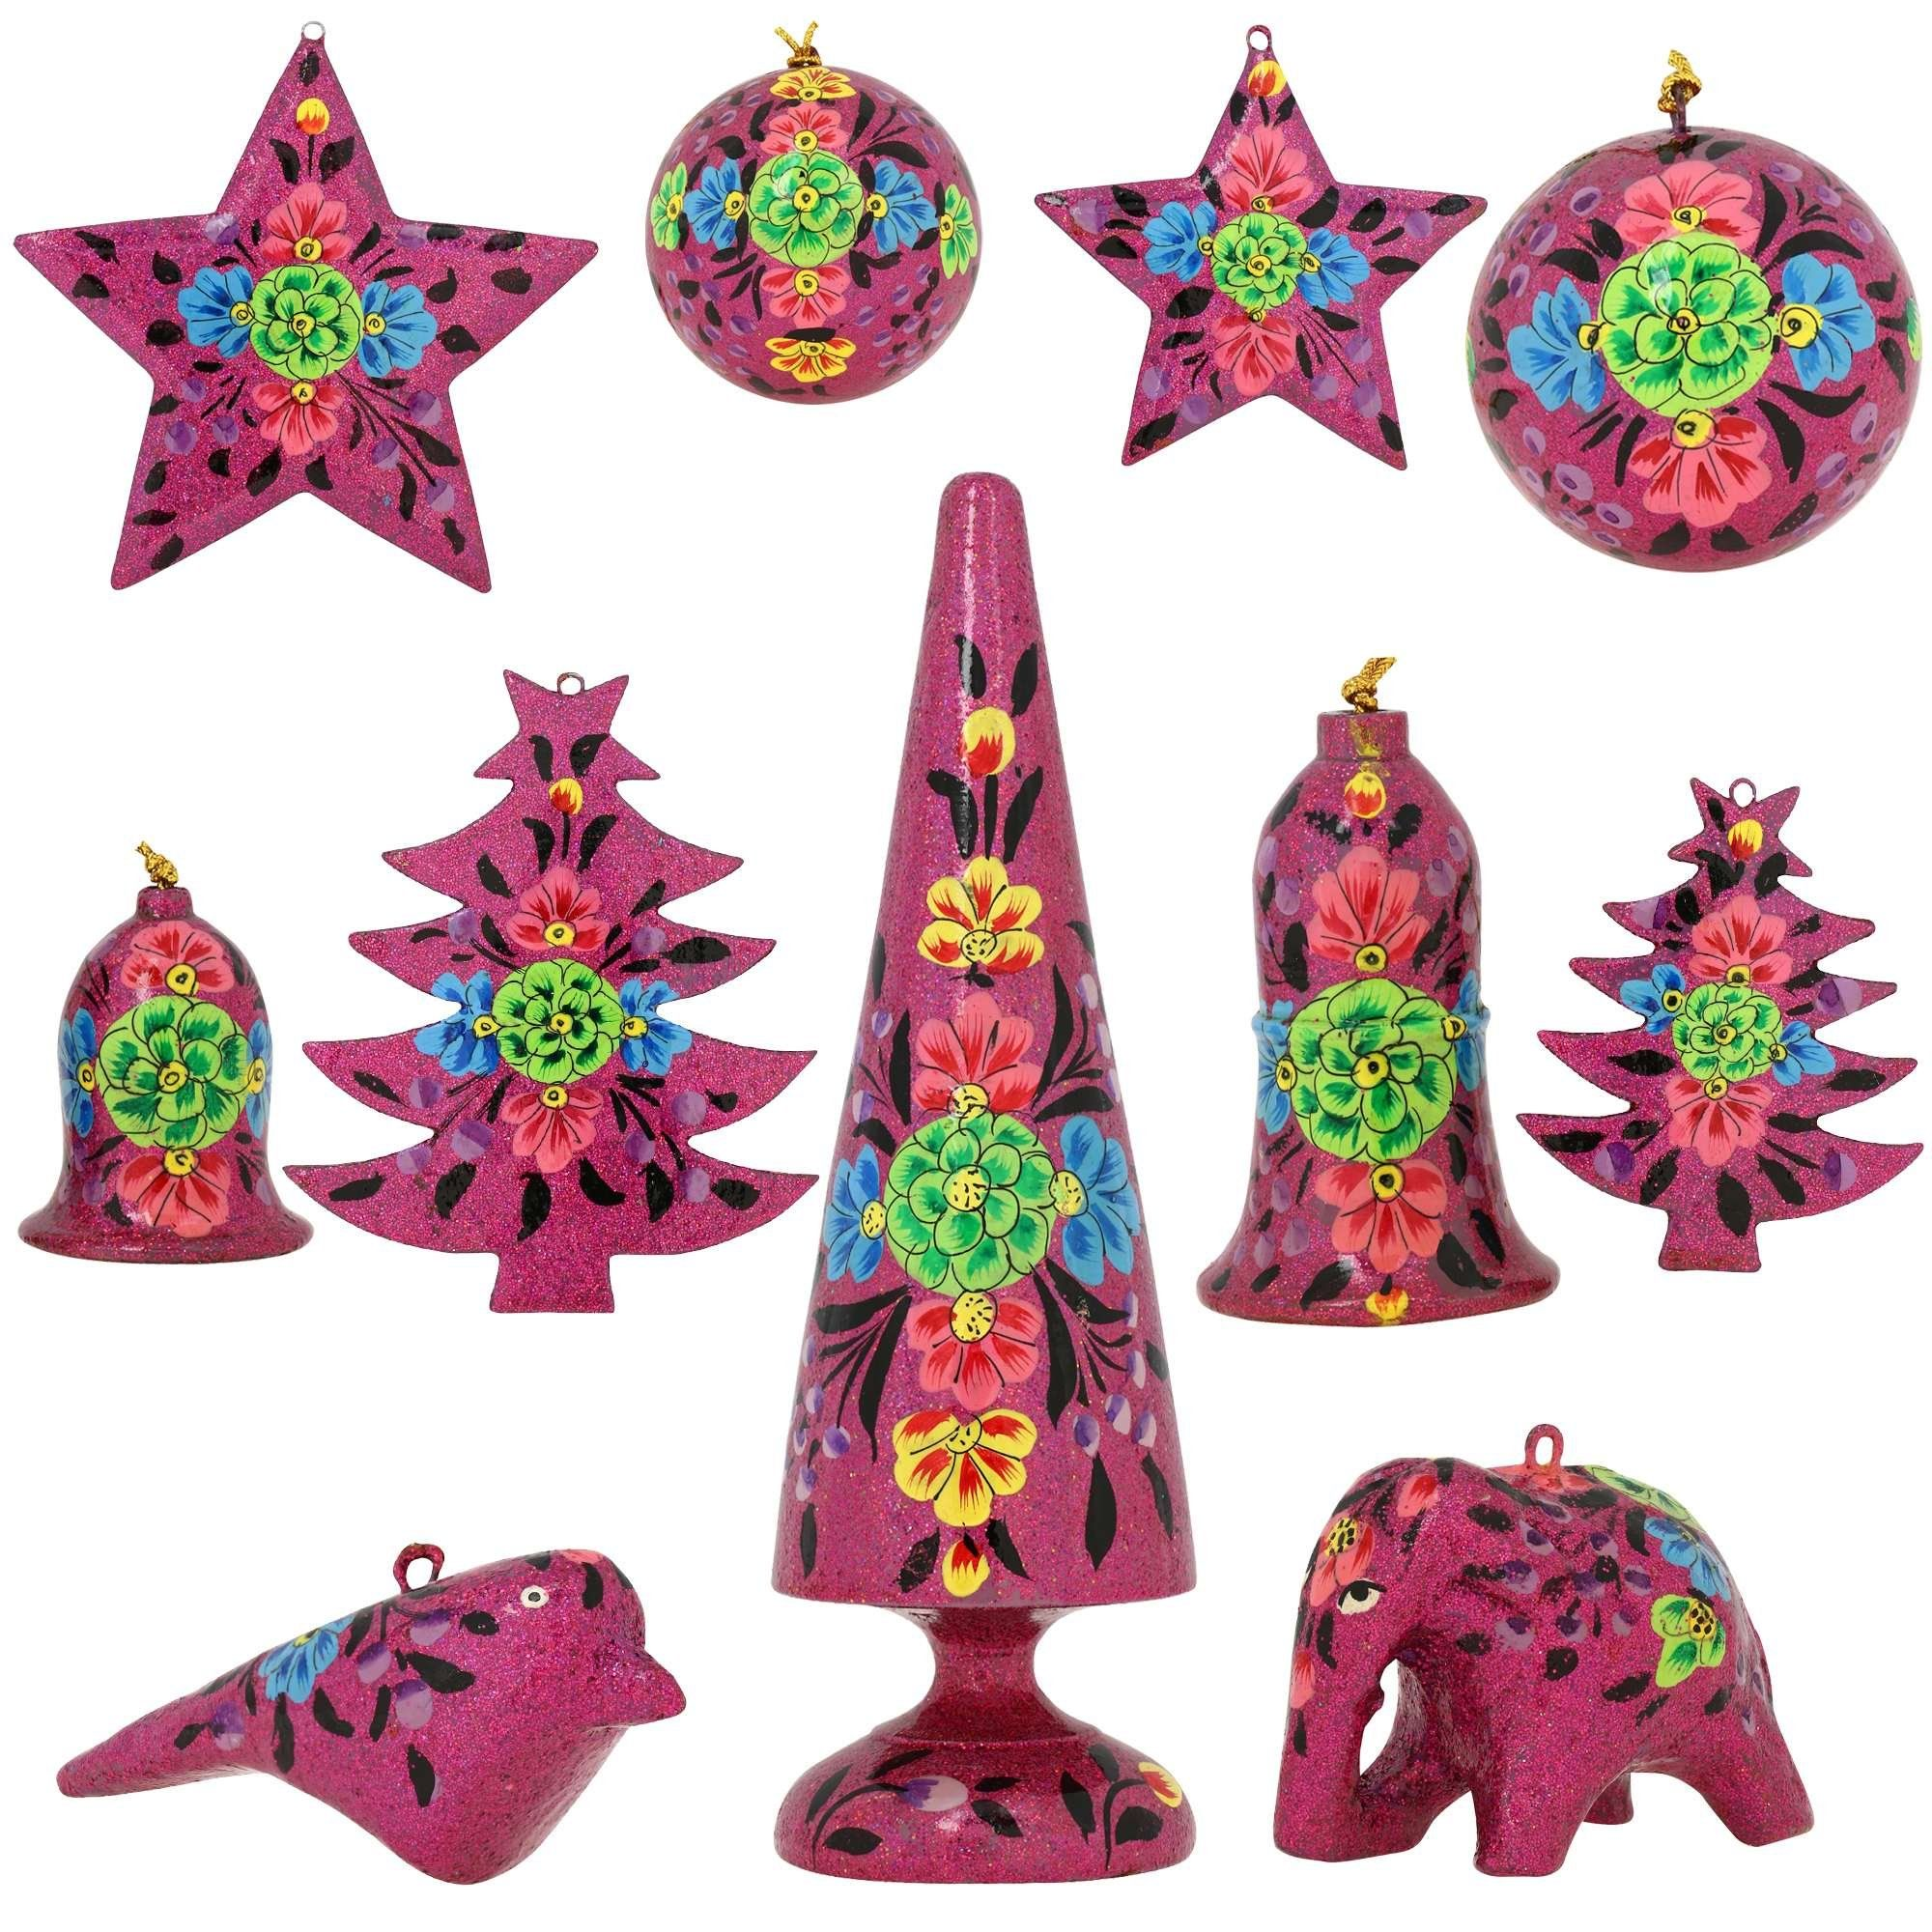 Amazon Com Set Of 11 Purple Floral Paper Mache Christmas Ornaments Handmade Indian Gifts Handmade Christmas Decorations Handmade Ornaments Paper Ornaments